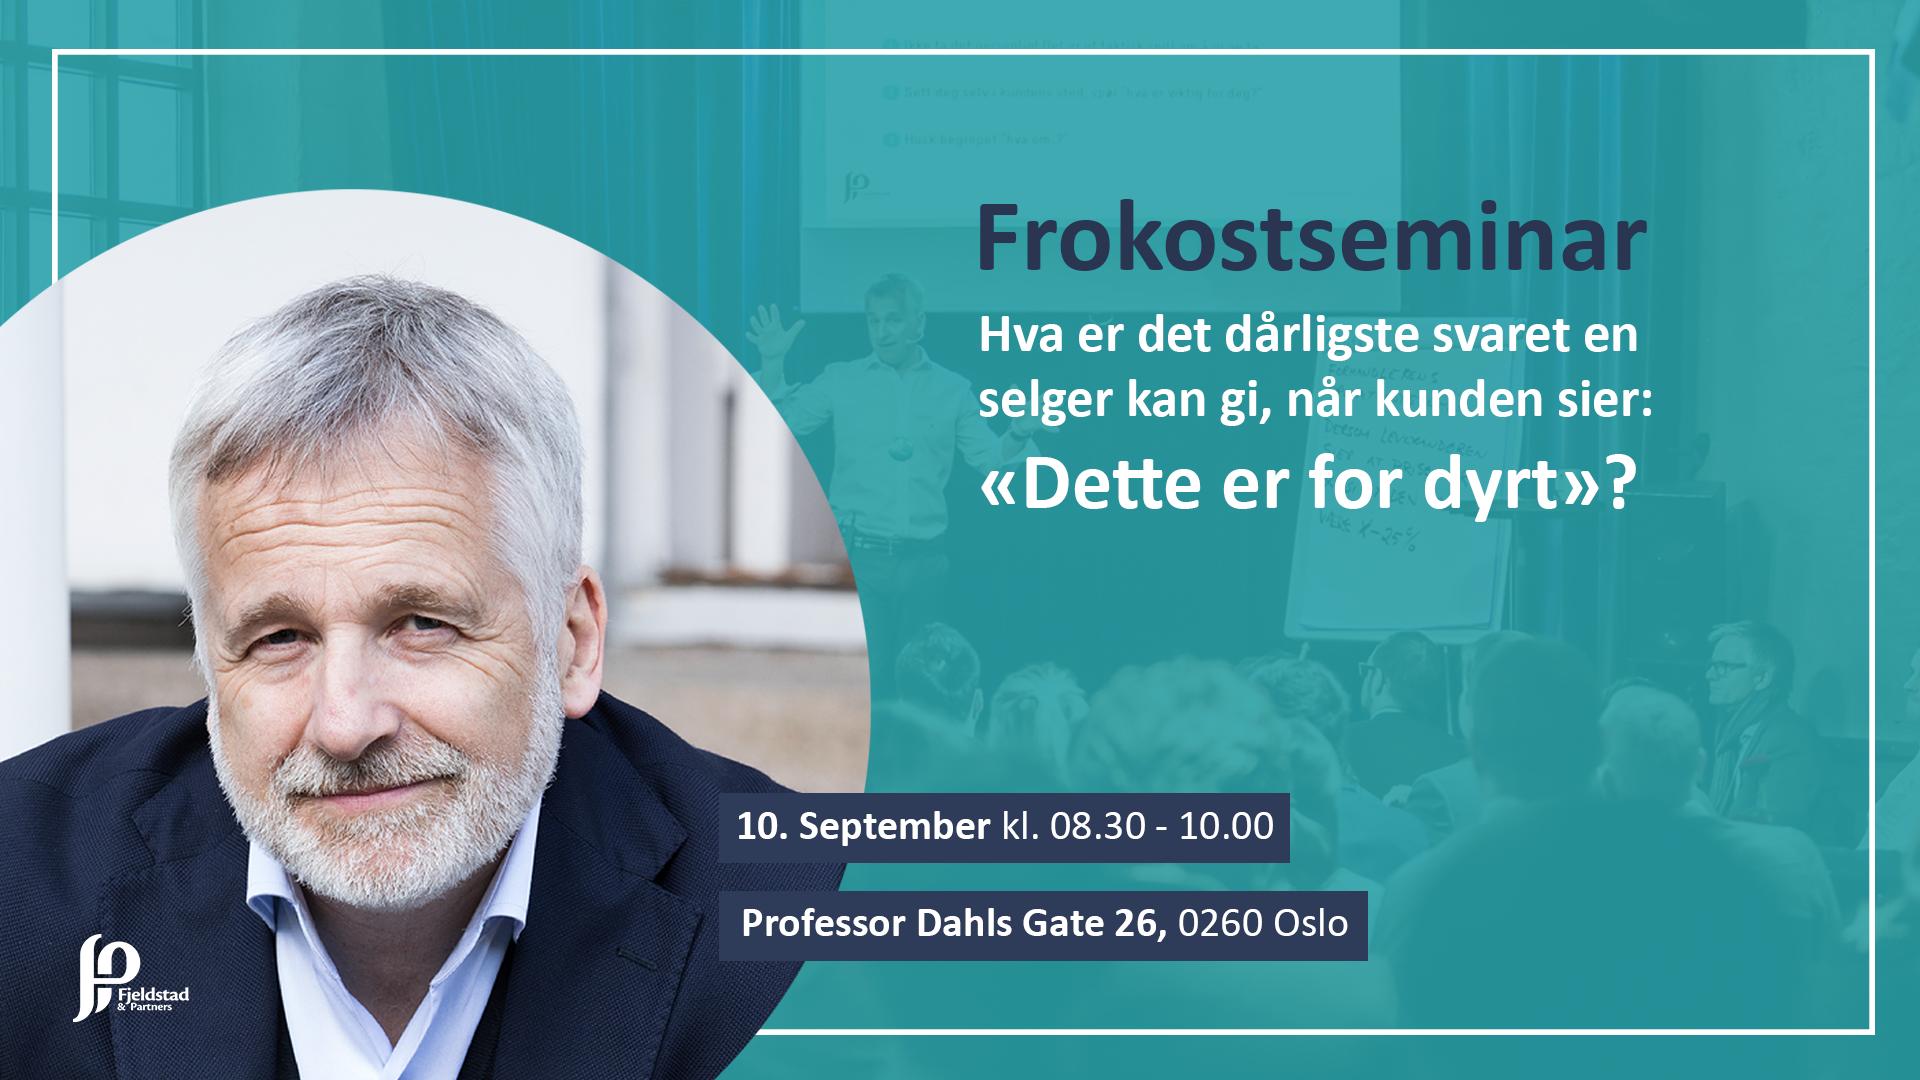 10.9 Frokostseminar_banner3.png